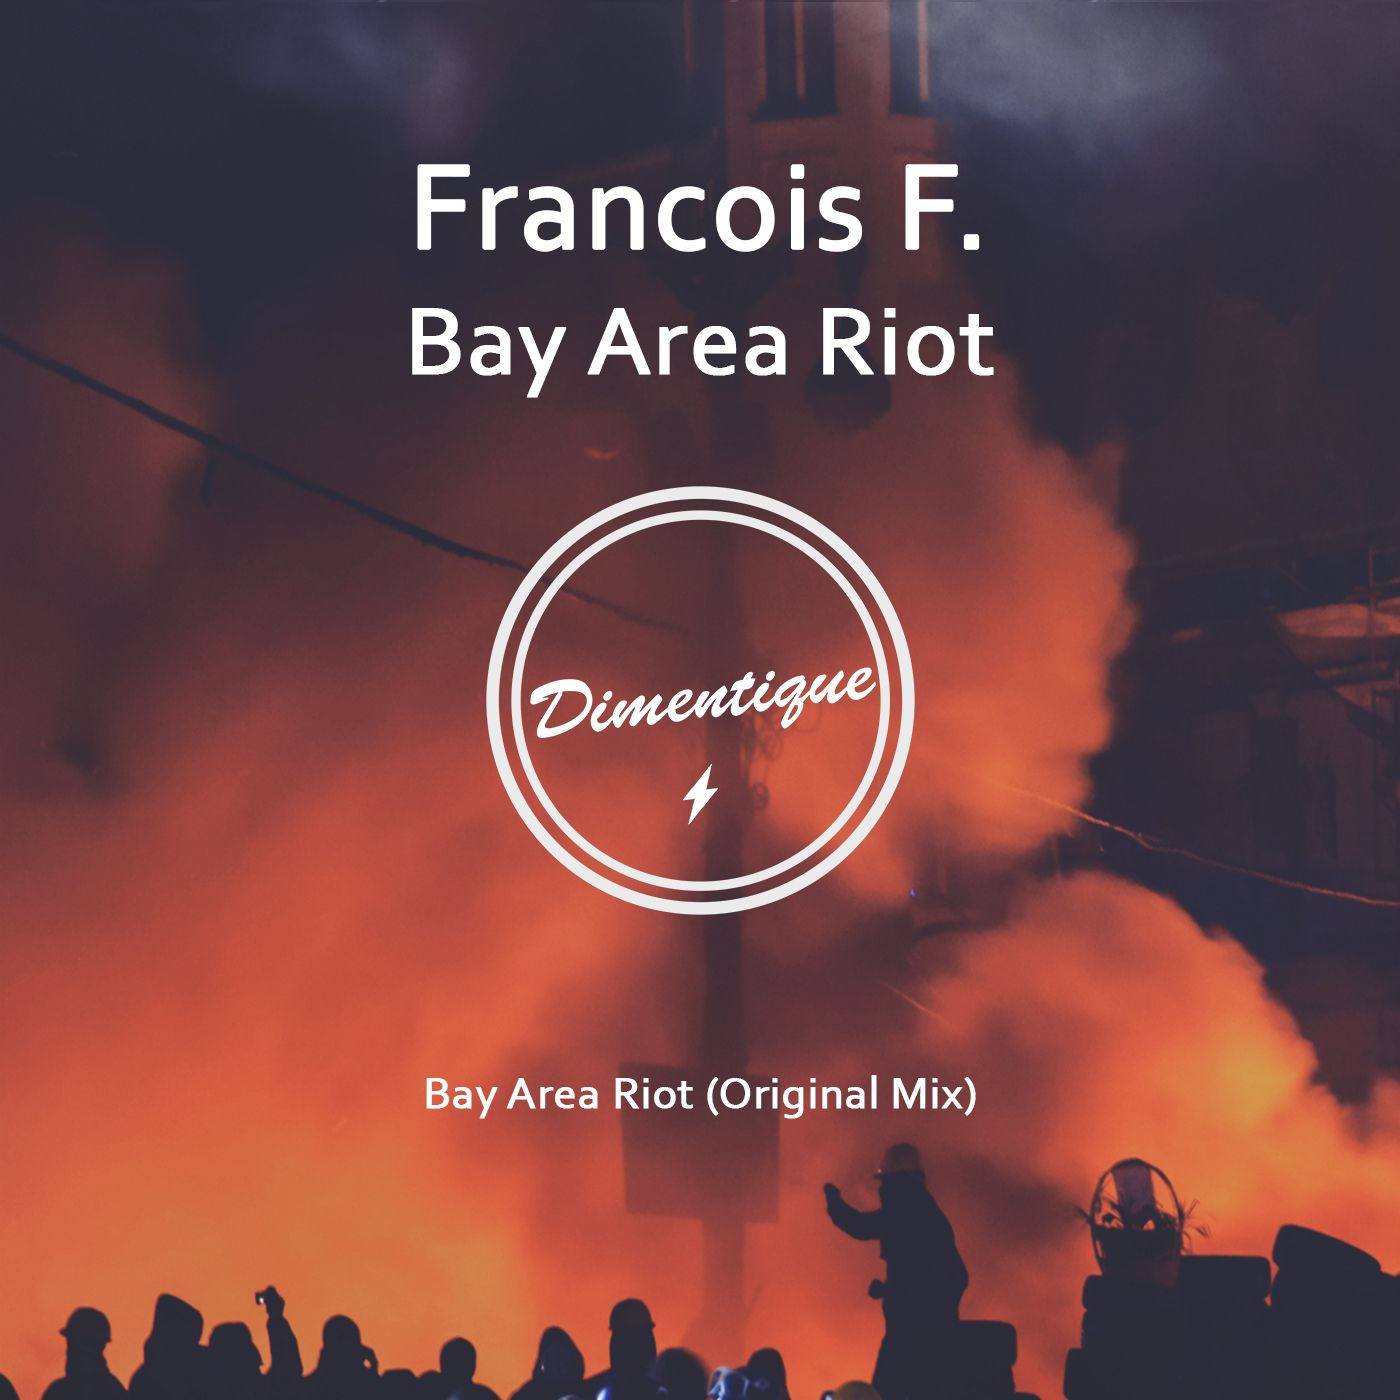 dimentique_new_art_2016_francois_f_bay_area_riot_.jpg